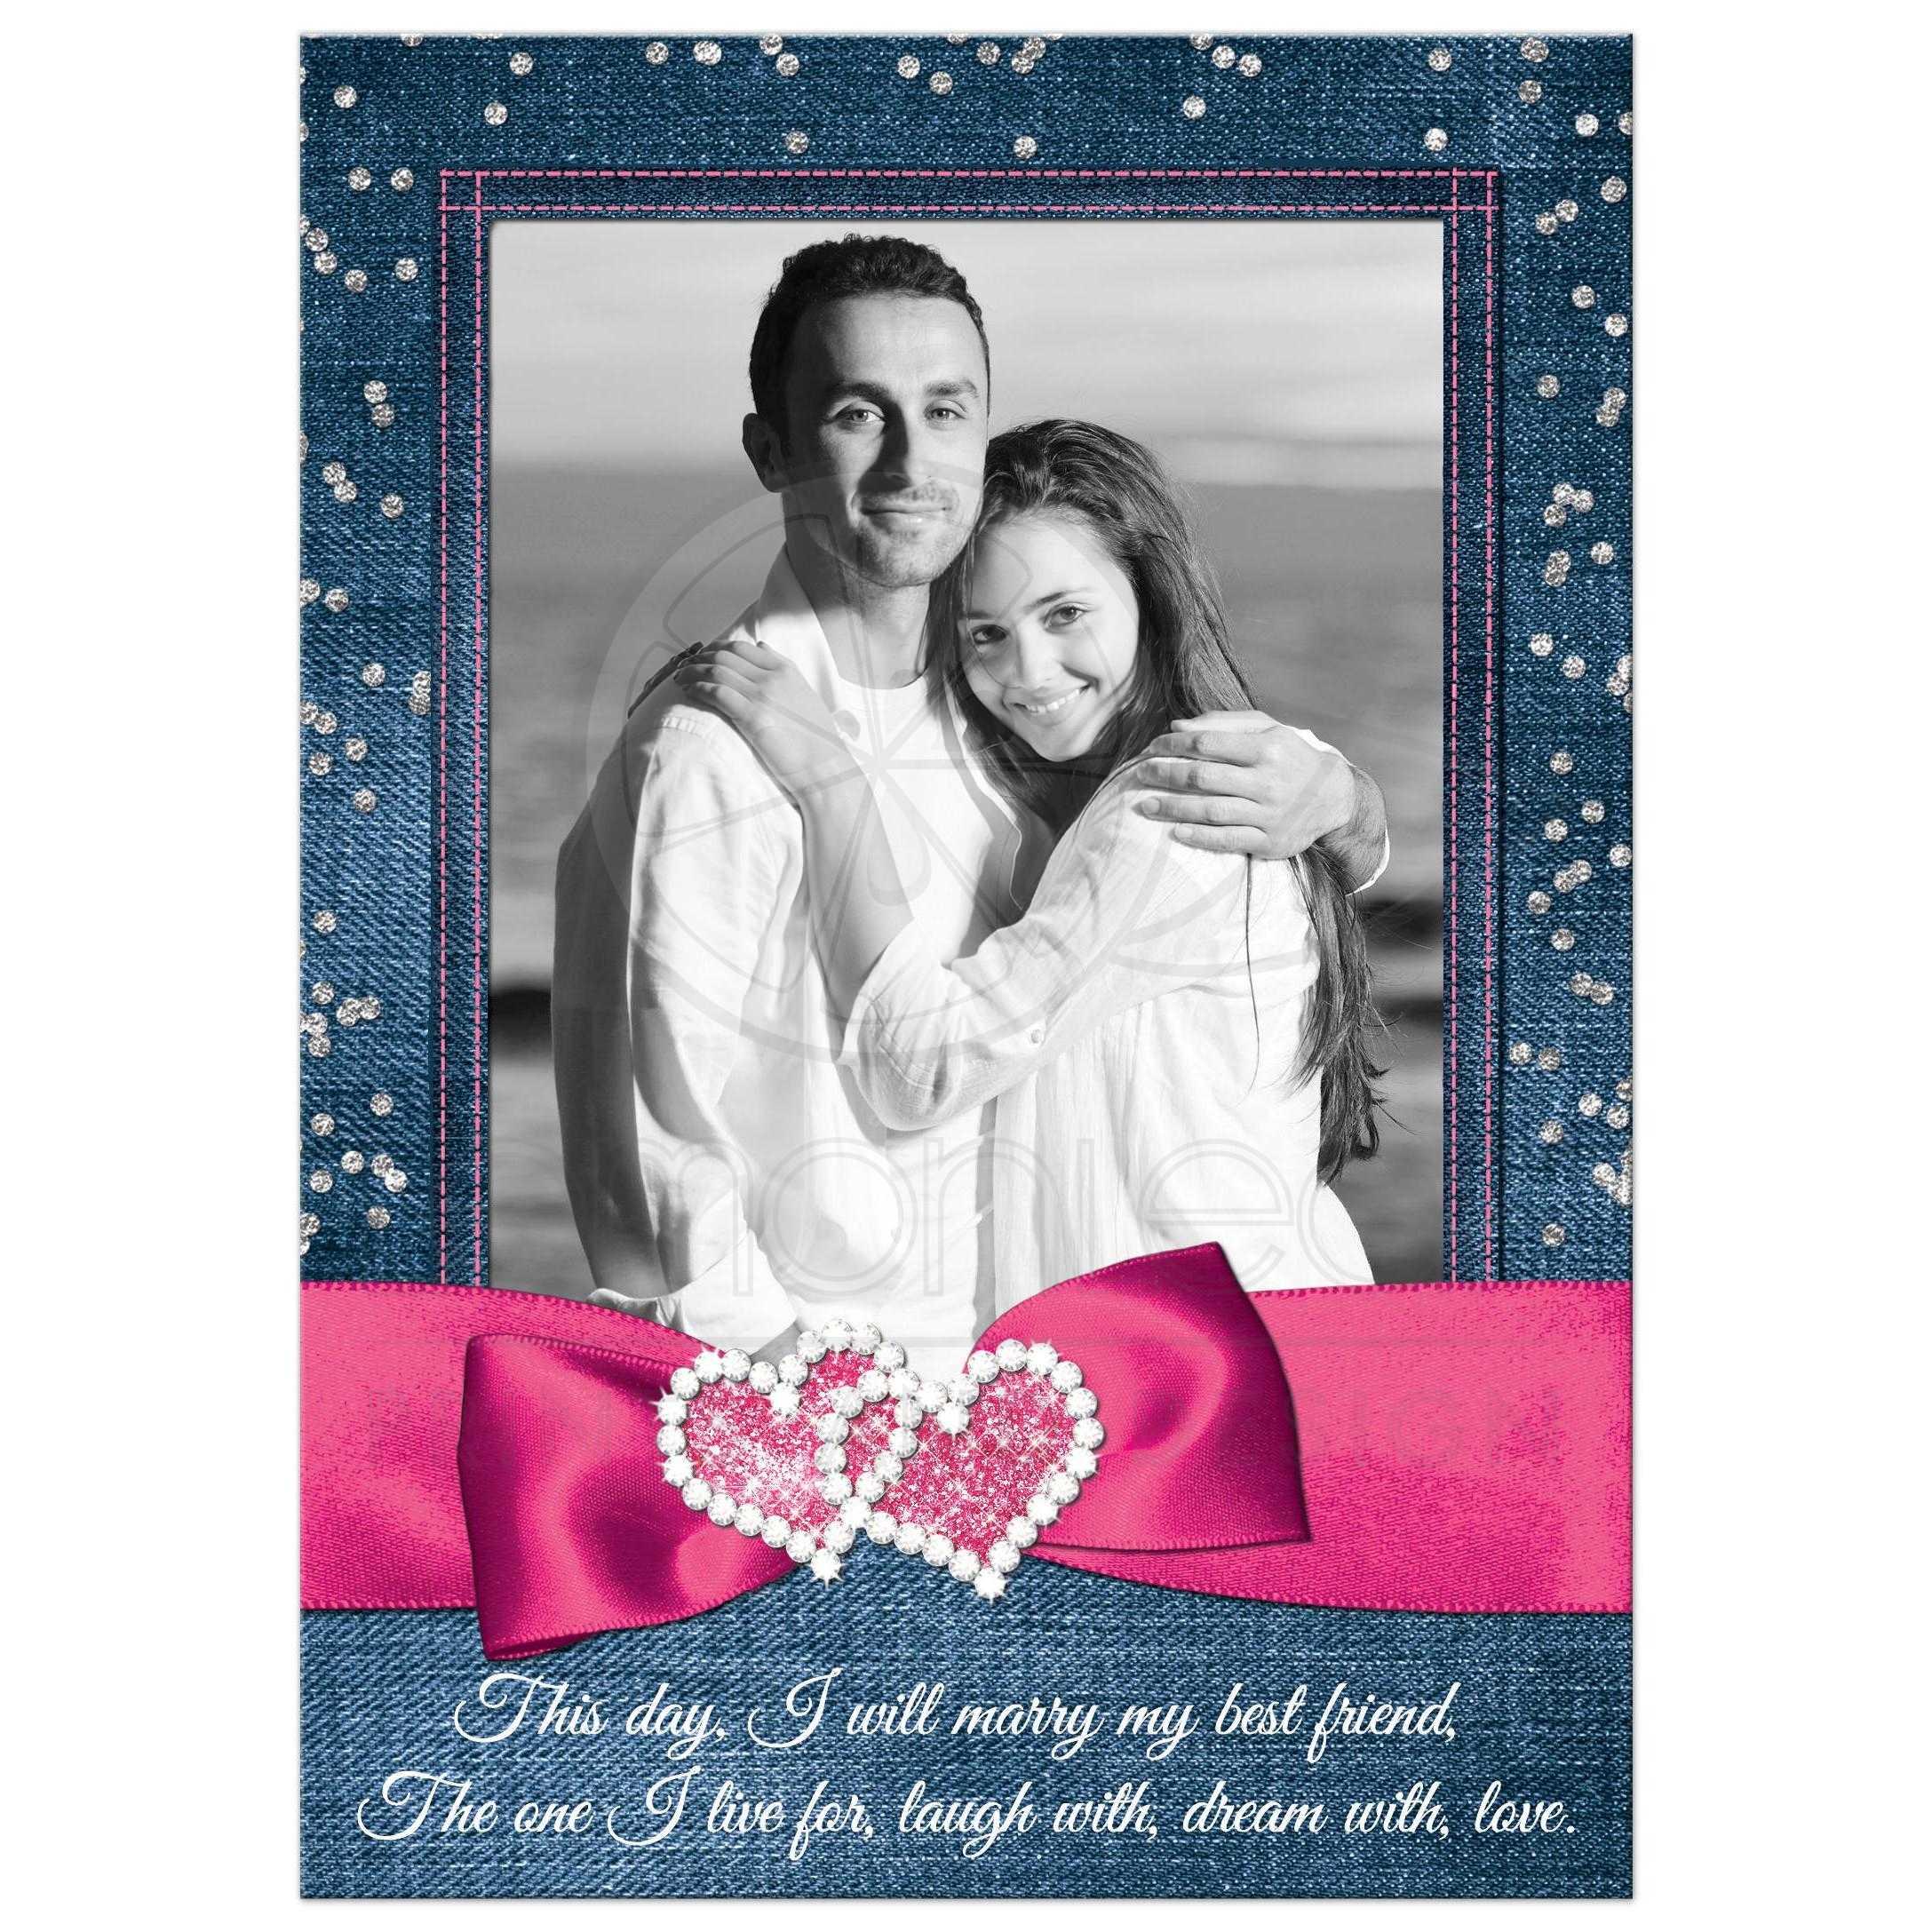 Denim And Diamonds Photo Wedding Invitation Faux Silver Confetti Ribbon Bow Joined Jeweled Hearts Pink